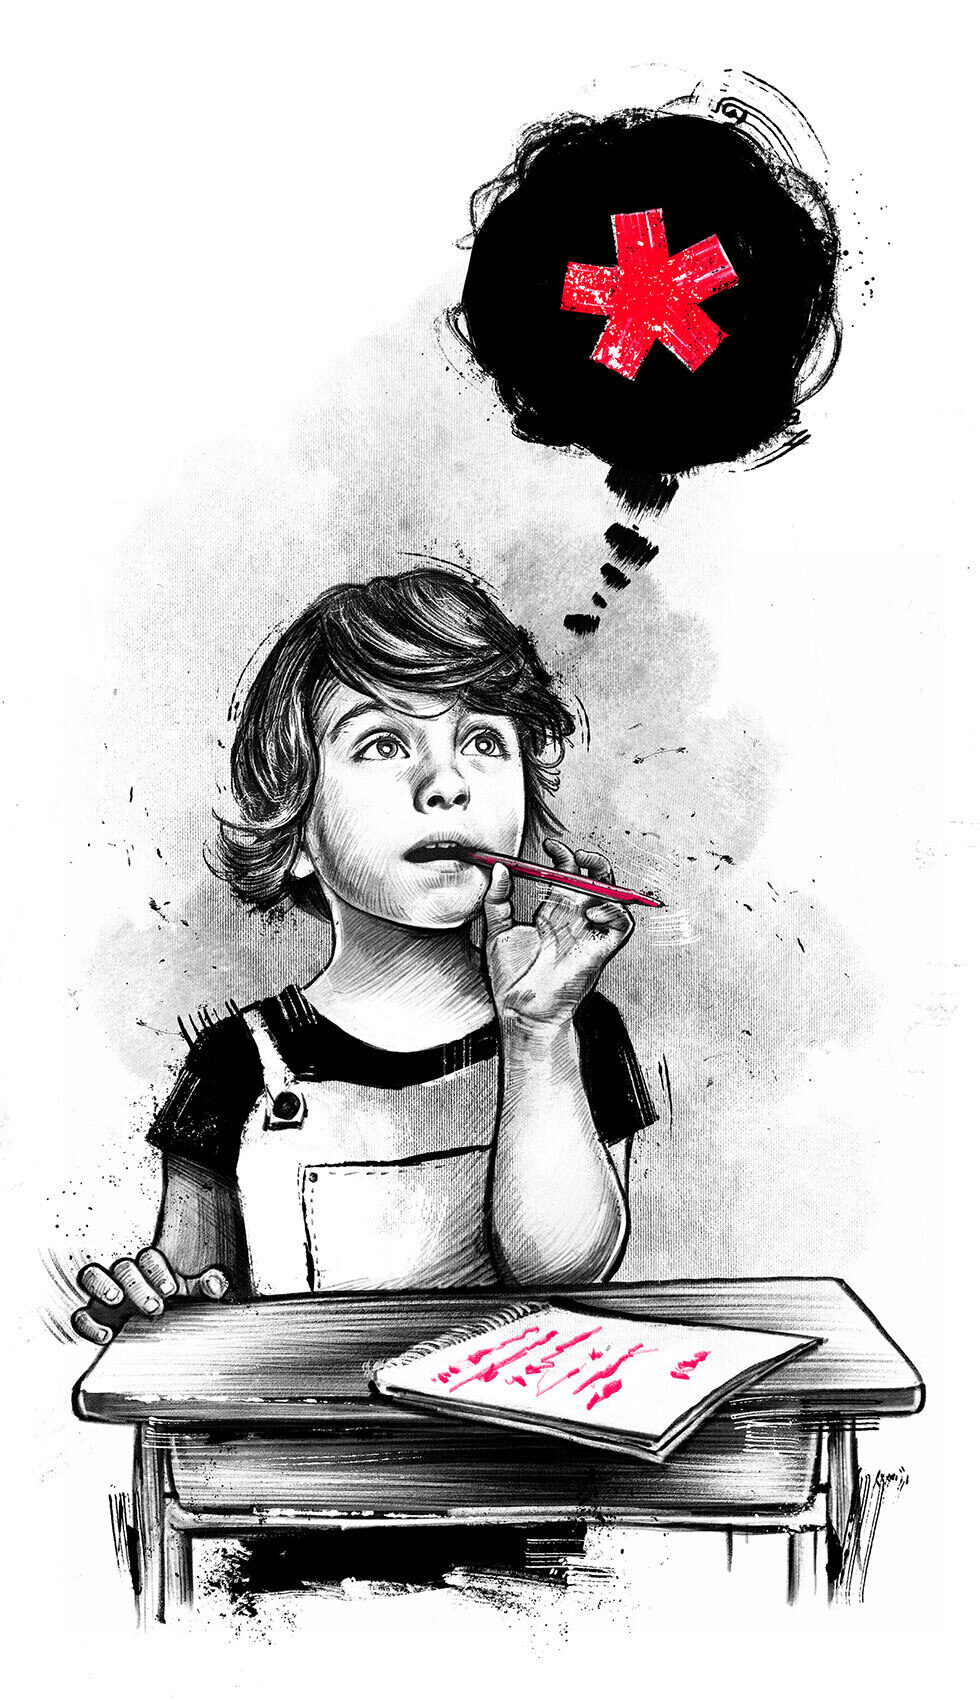 Illustration primary school schulbank gender equitable spelling asterisk sternchen conceptual editorial - Kornel Illustration | Kornel Stadler portfolio